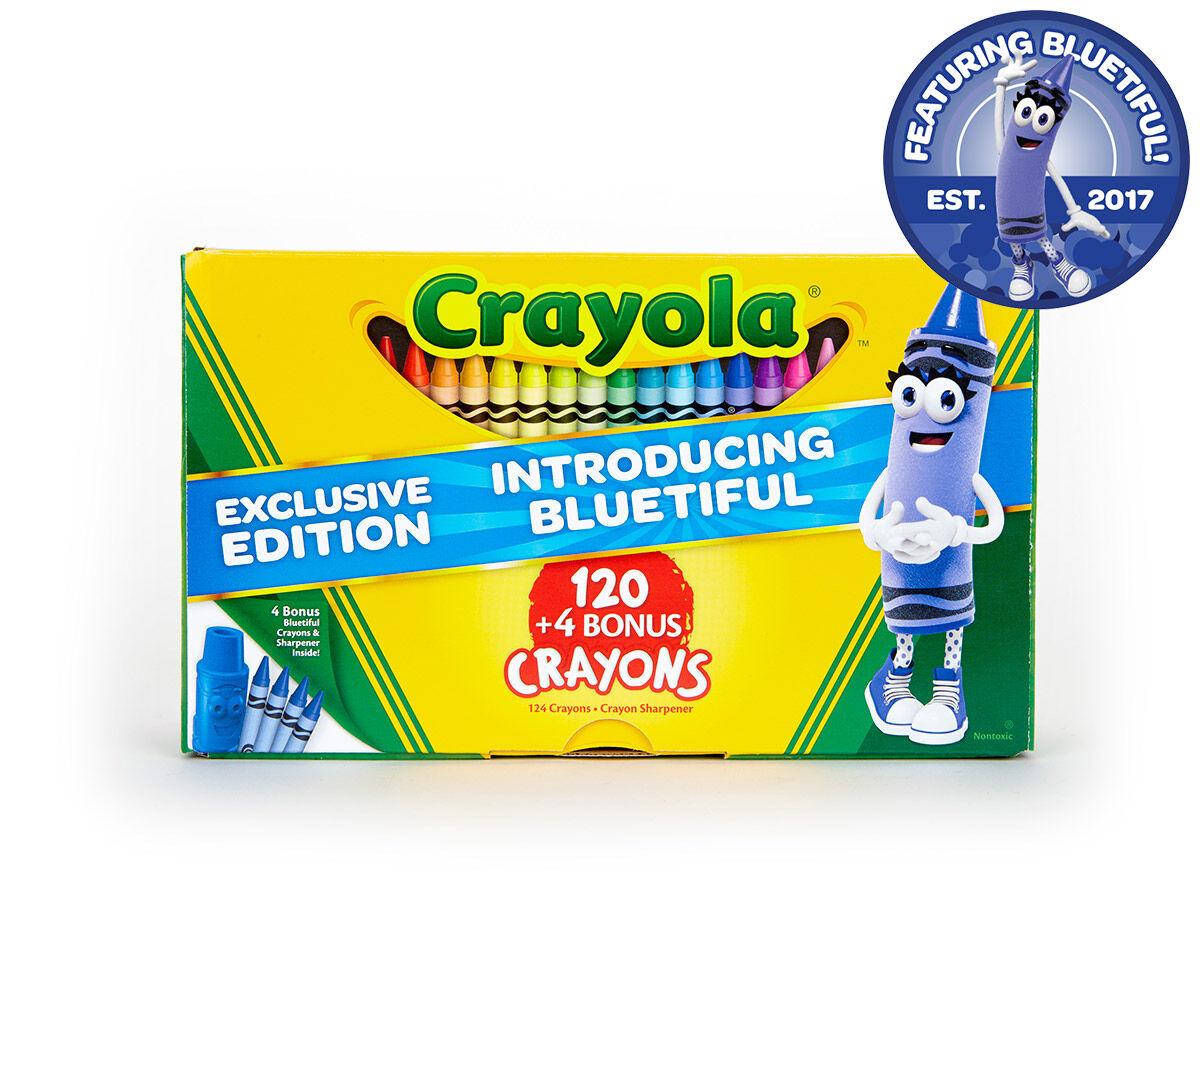 Crayola Crayons 120 ct. plus 4 bonus Crayons